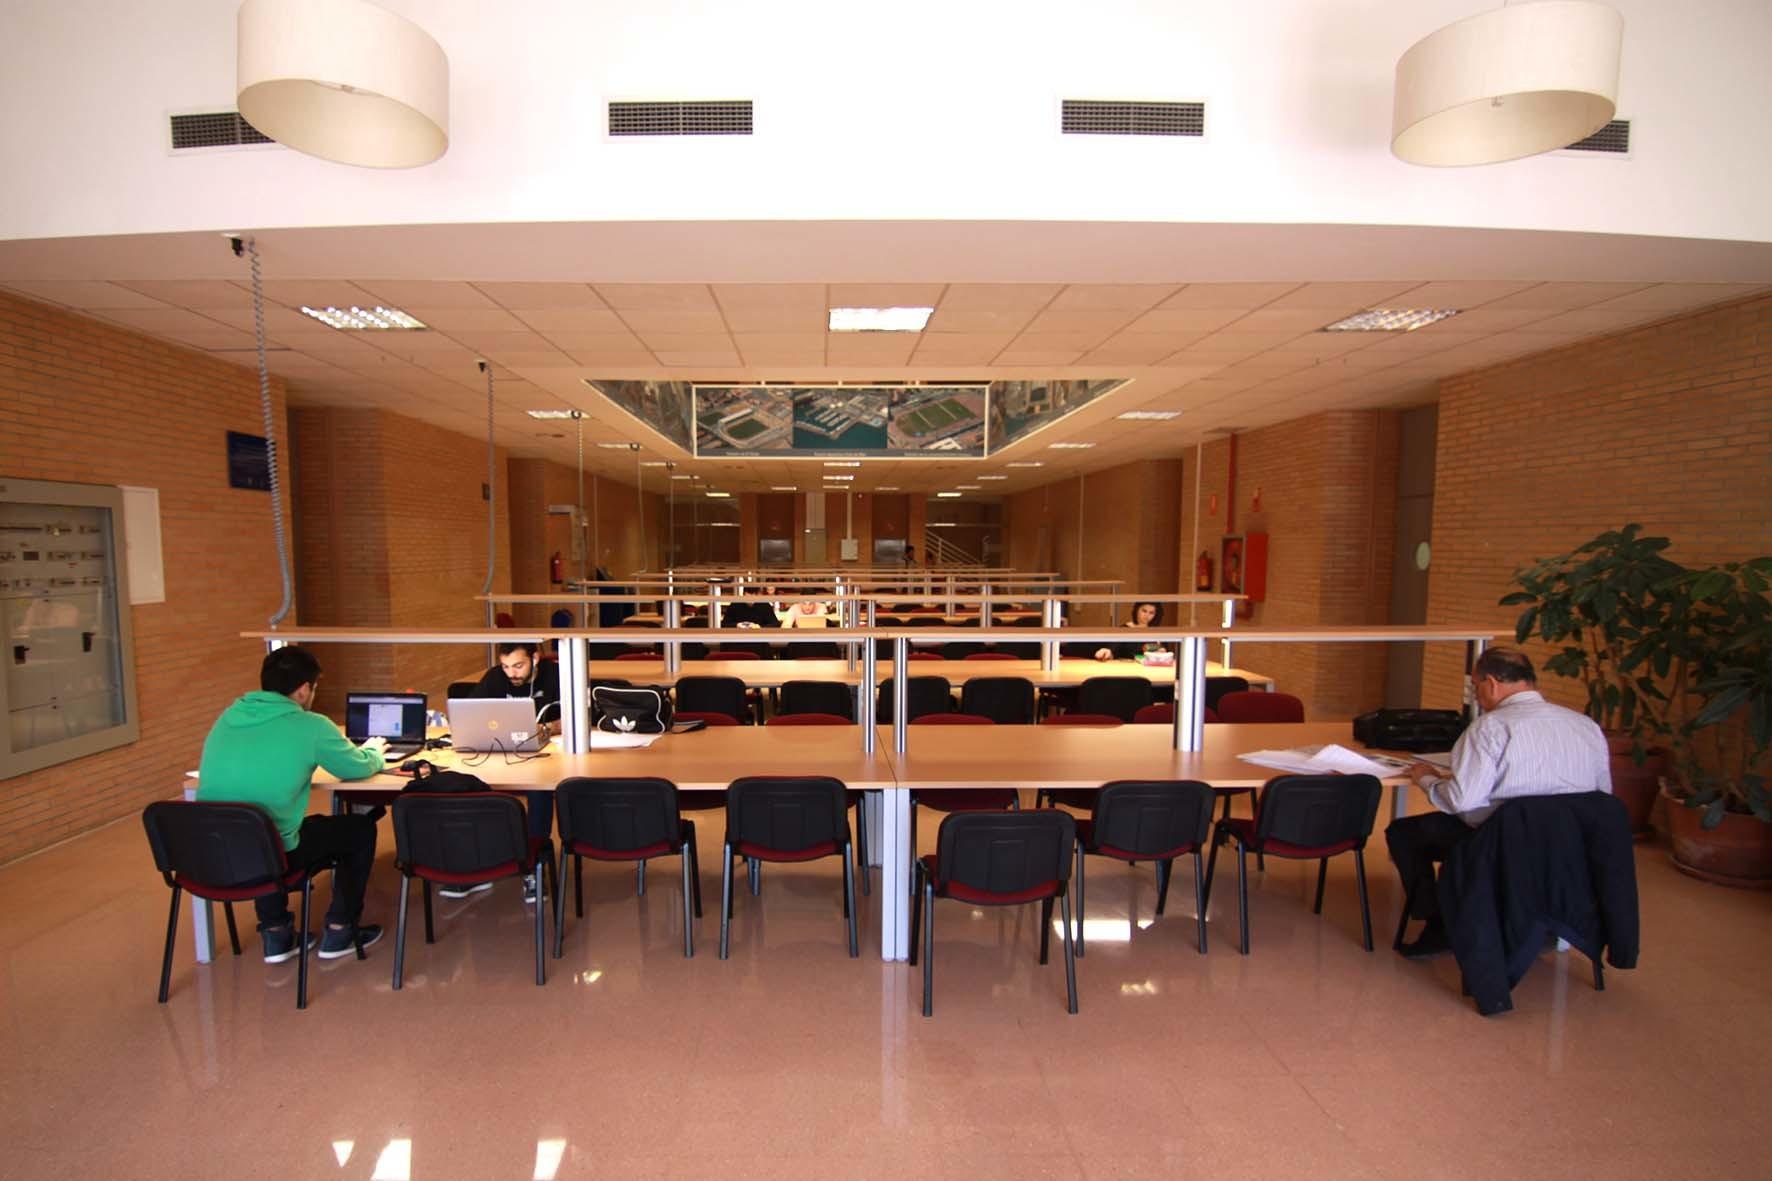 la ual ampl a la sala de estudio 24 horas de la biblioteca